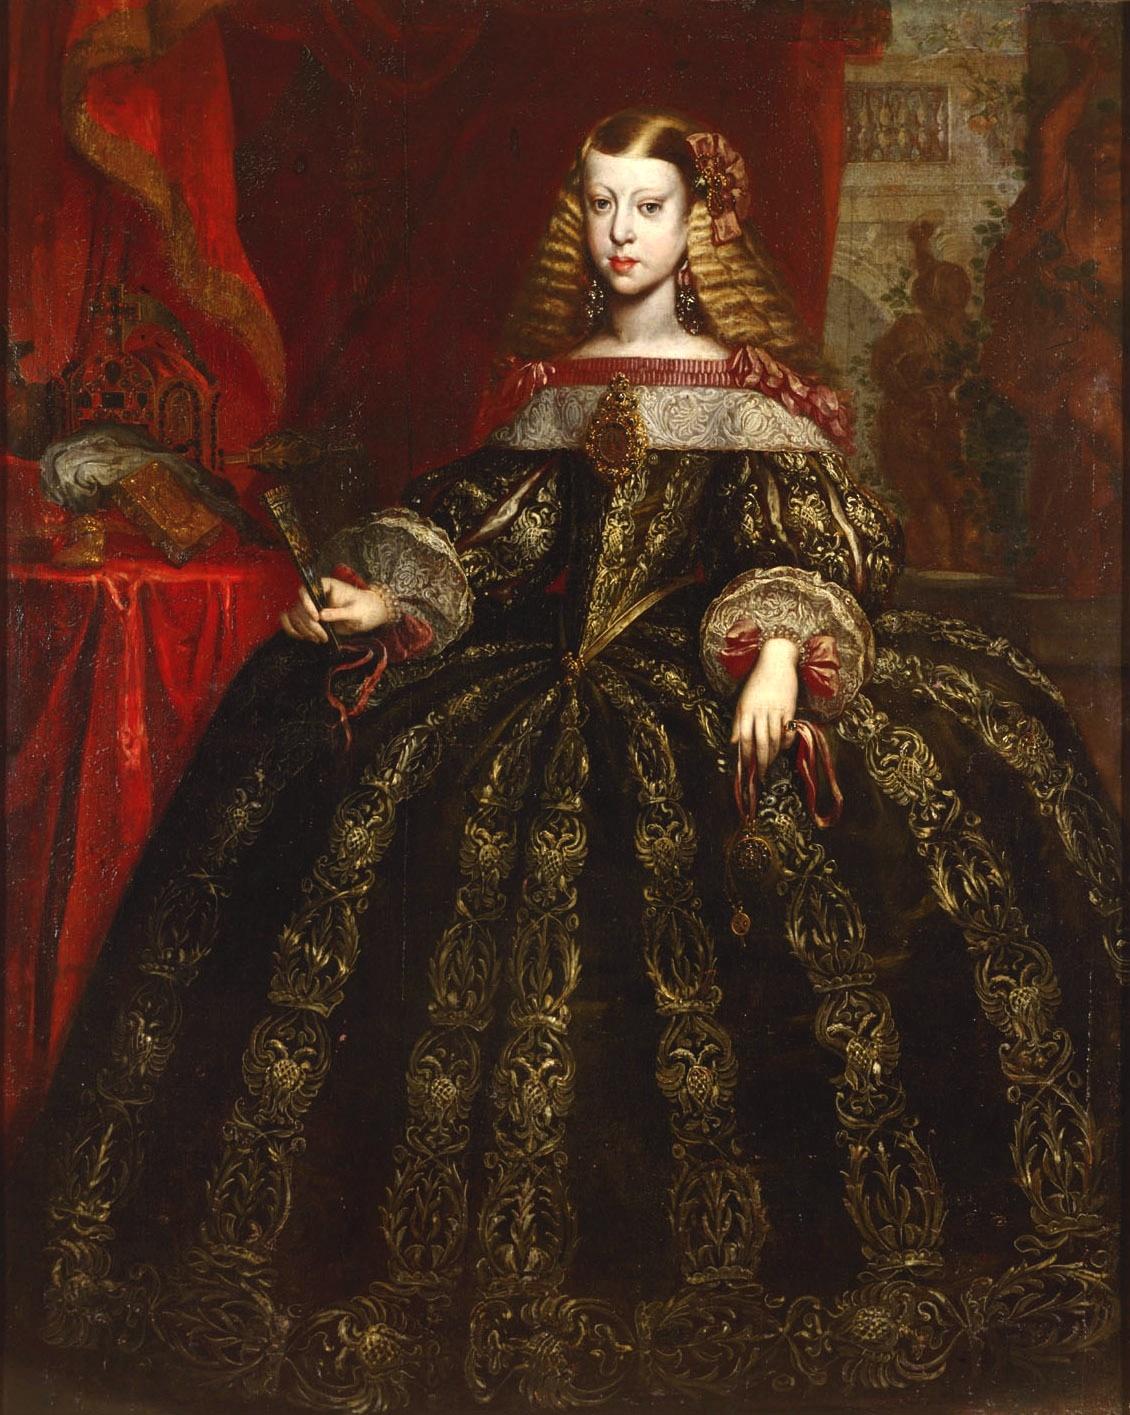 http://upload.wikimedia.org/wikipedia/commons/4/4e/Gerard_Du_Chateau_001.jpg